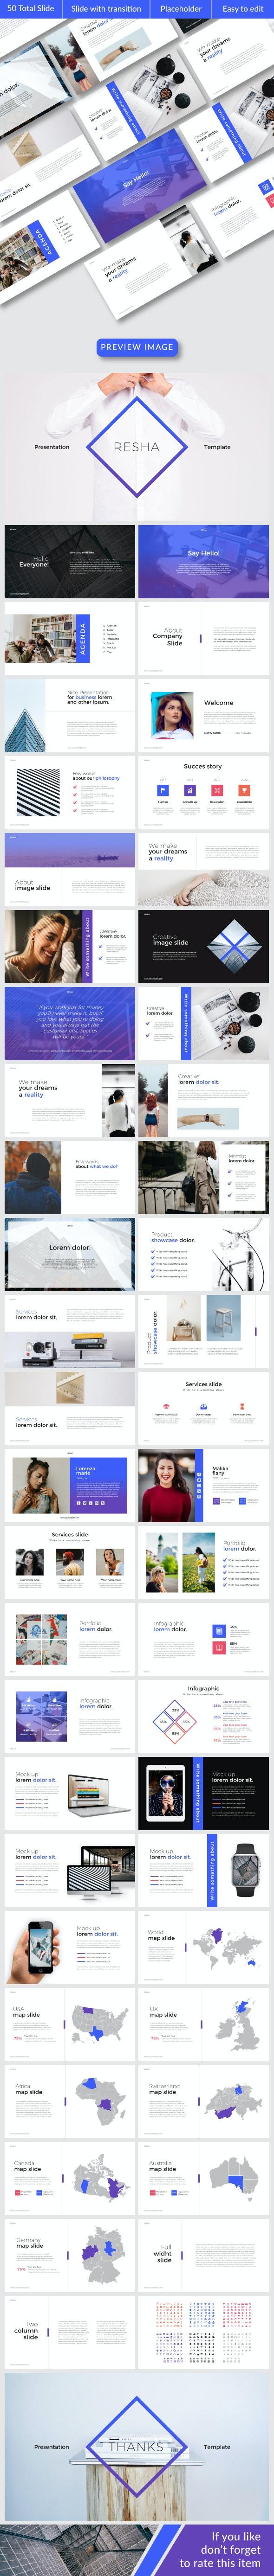 Resha Google Slide Temp - Google Slides Presentation Templates